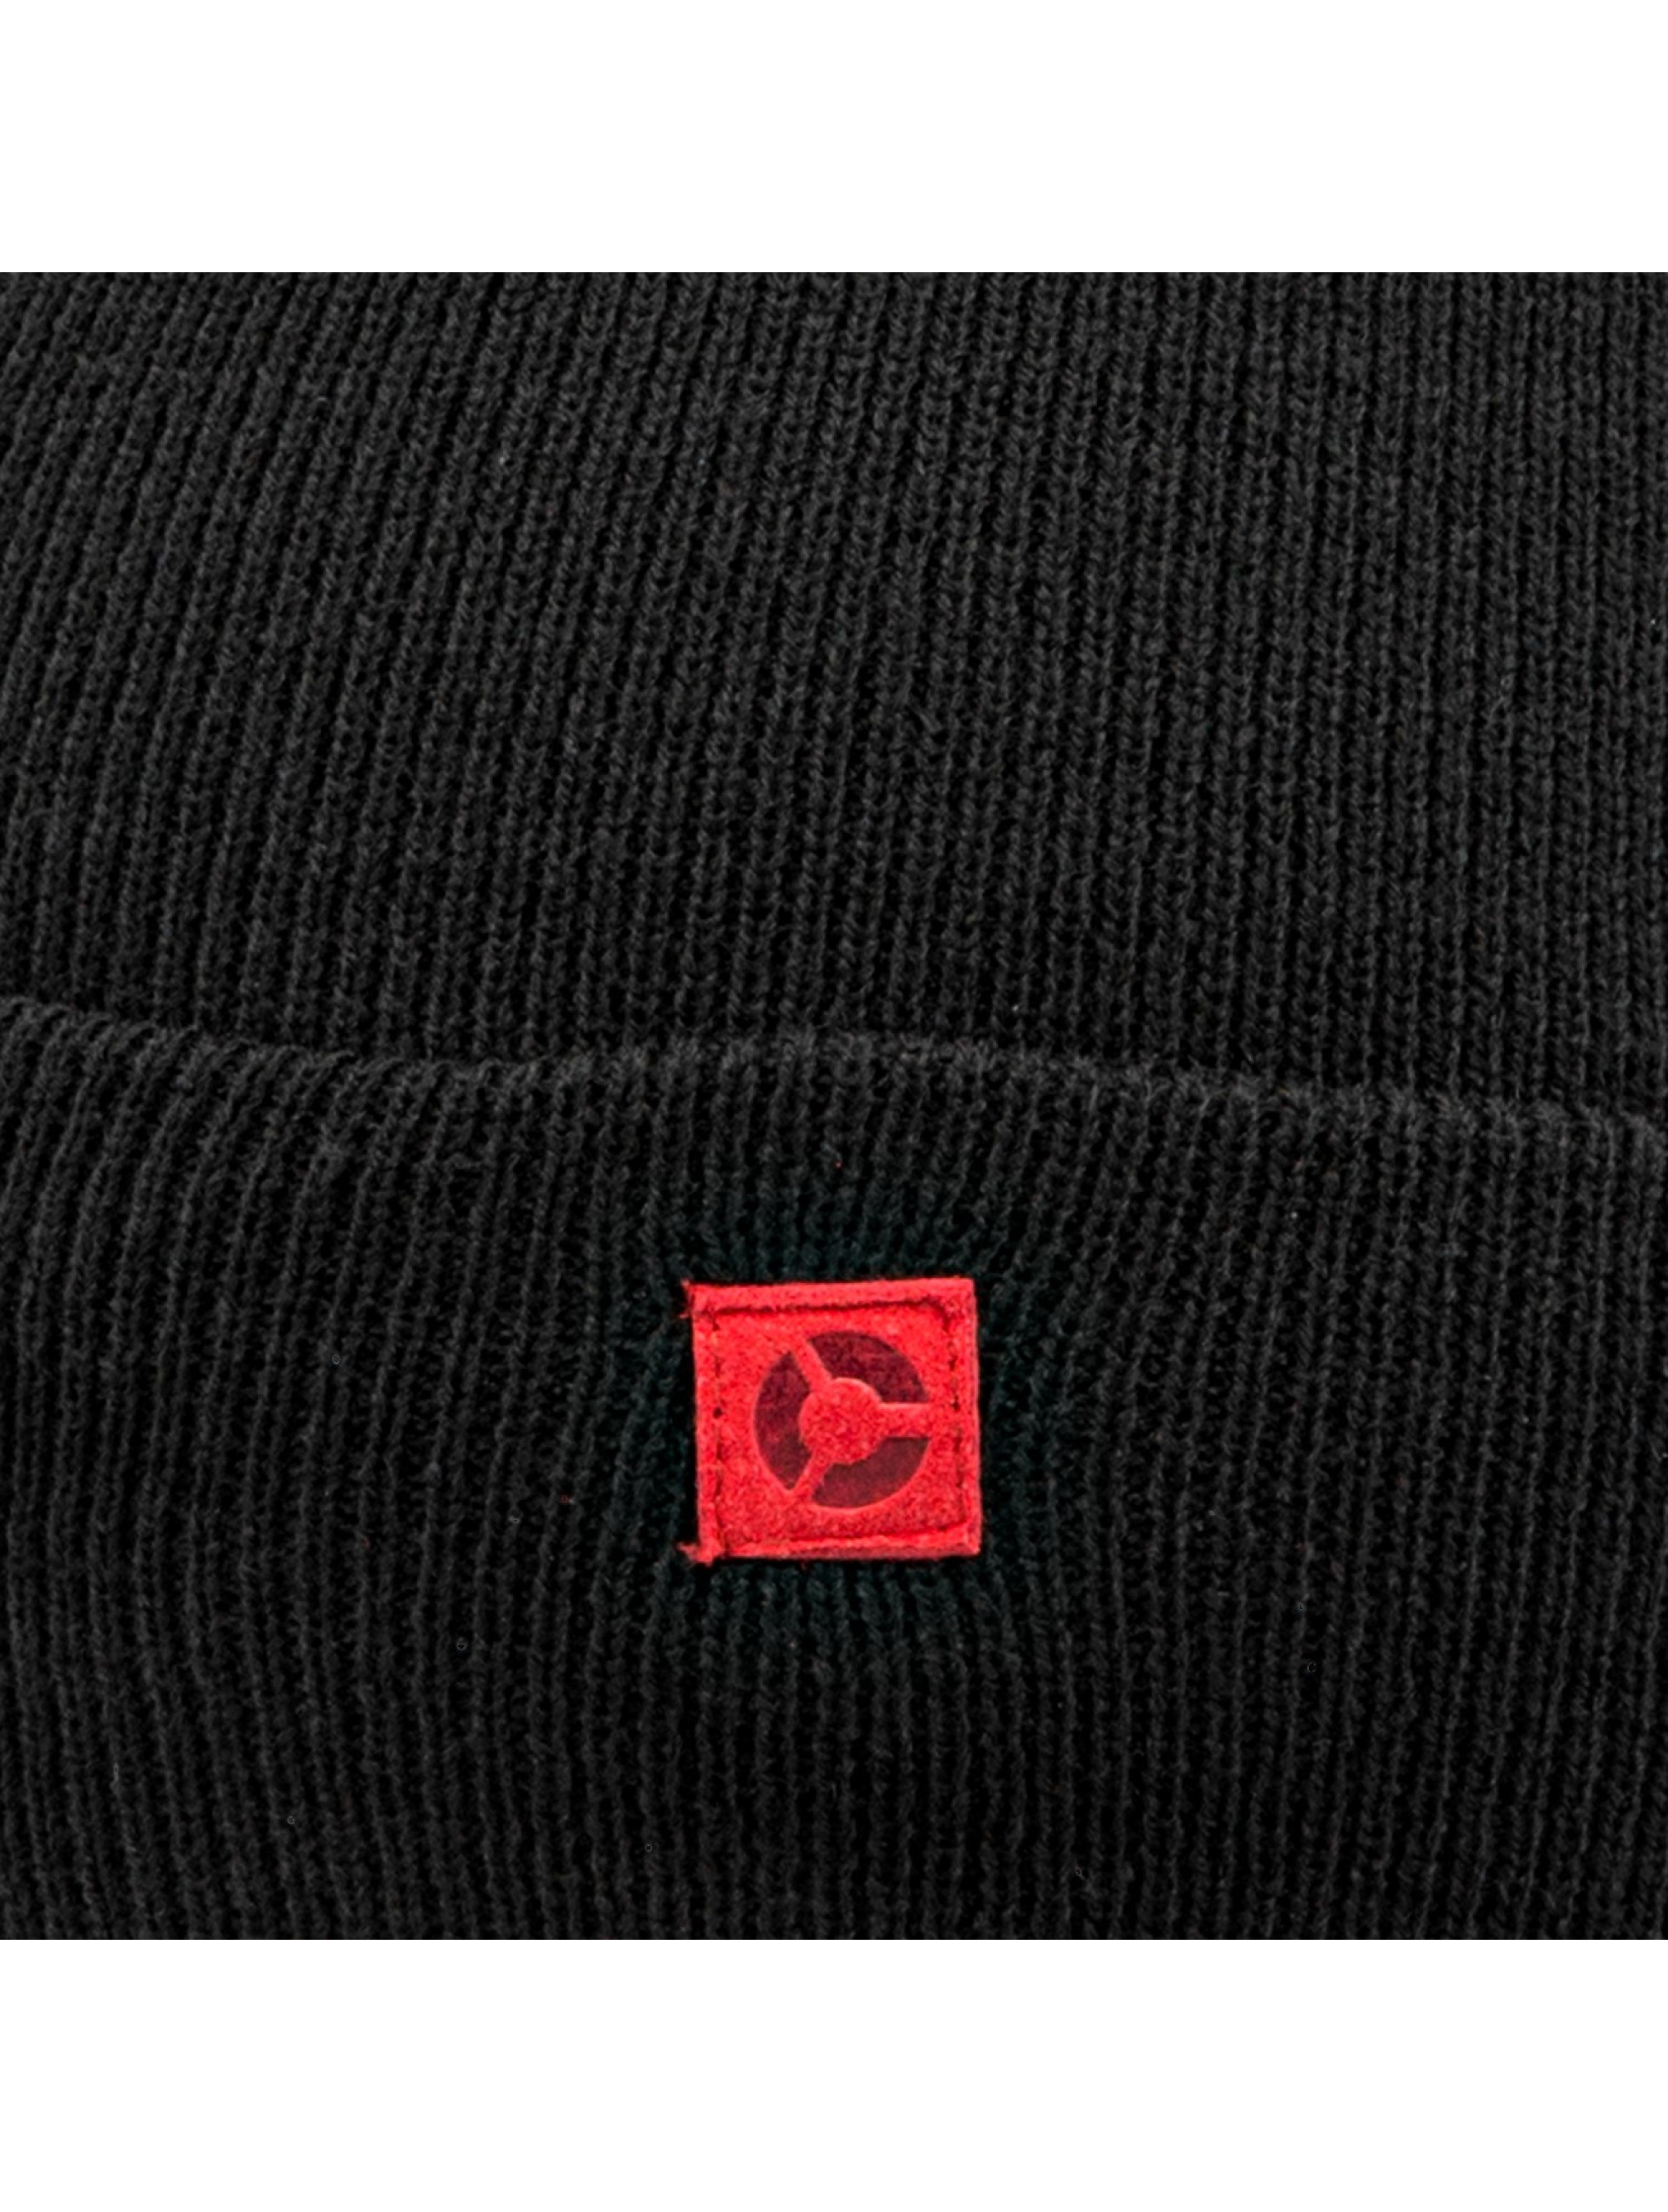 MSTRDS шляпа P Letter черный